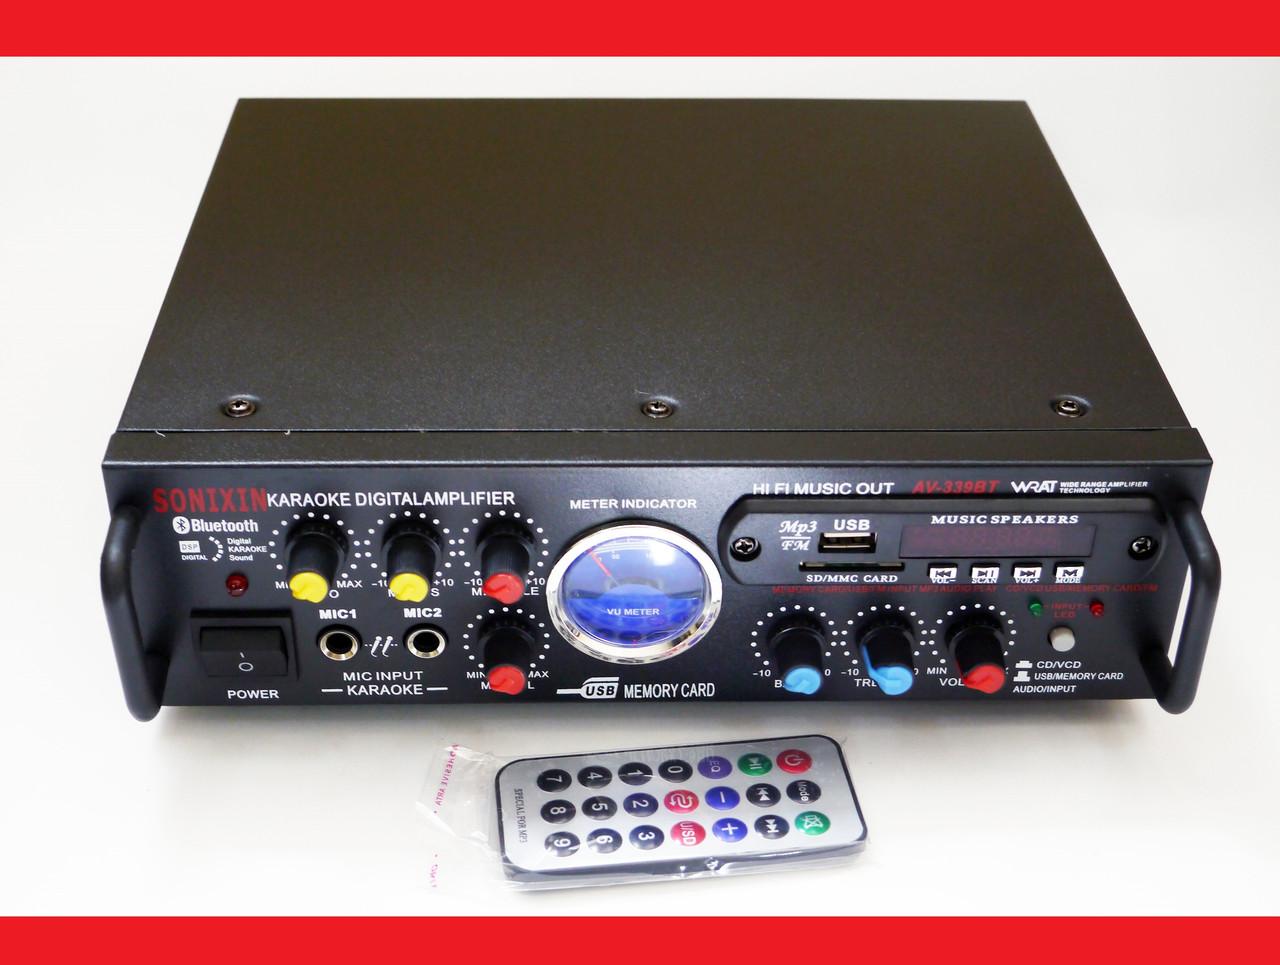 Усилитель звука Sonixin AV-339BT + USB + Fm + Mp3 + КАРАОКЕ + Bluetooth